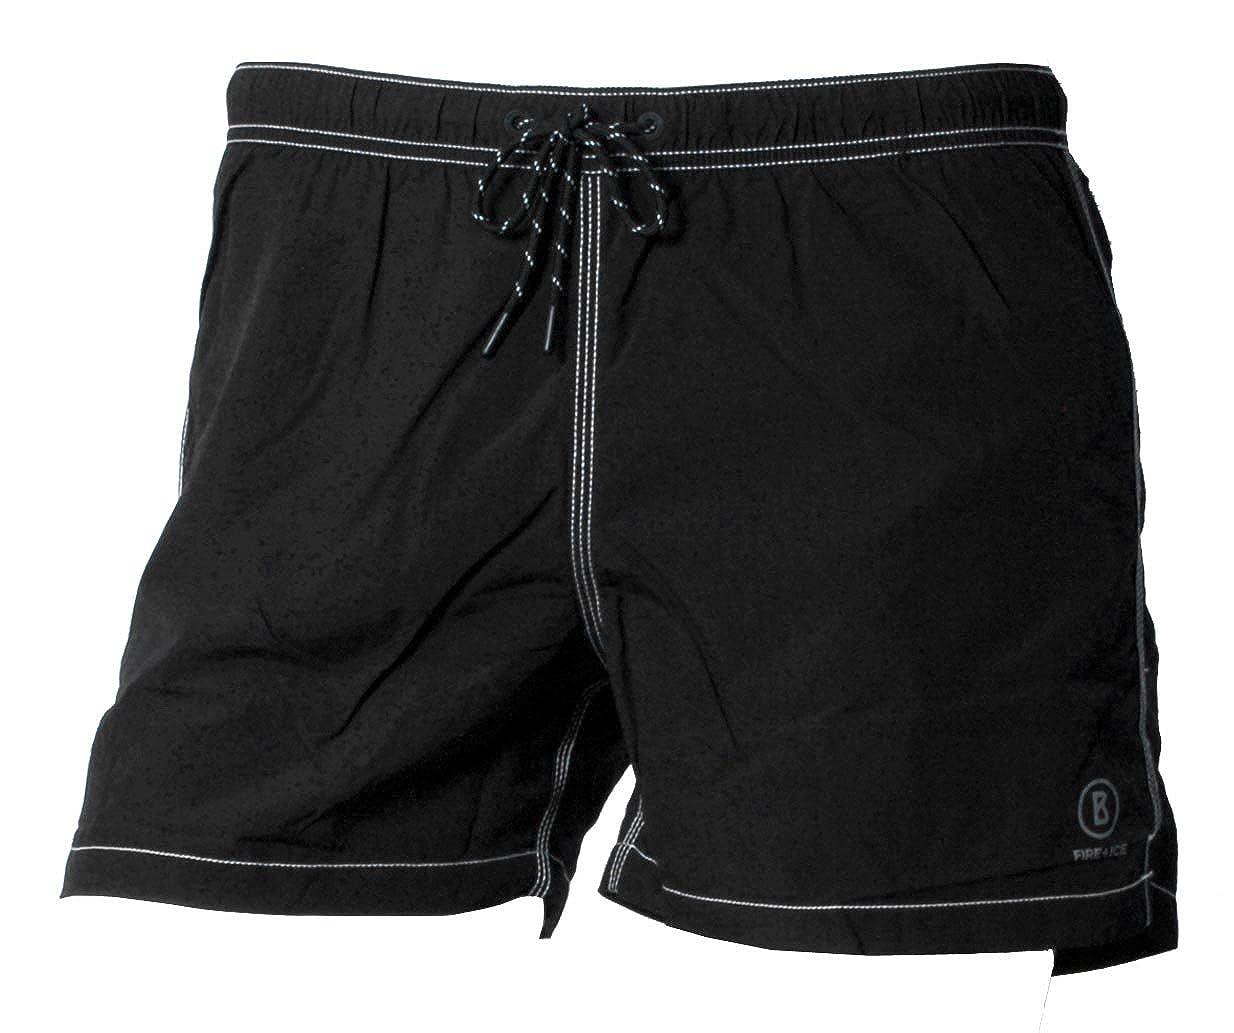 Noir 95 (XL) Bogner courte de Bain